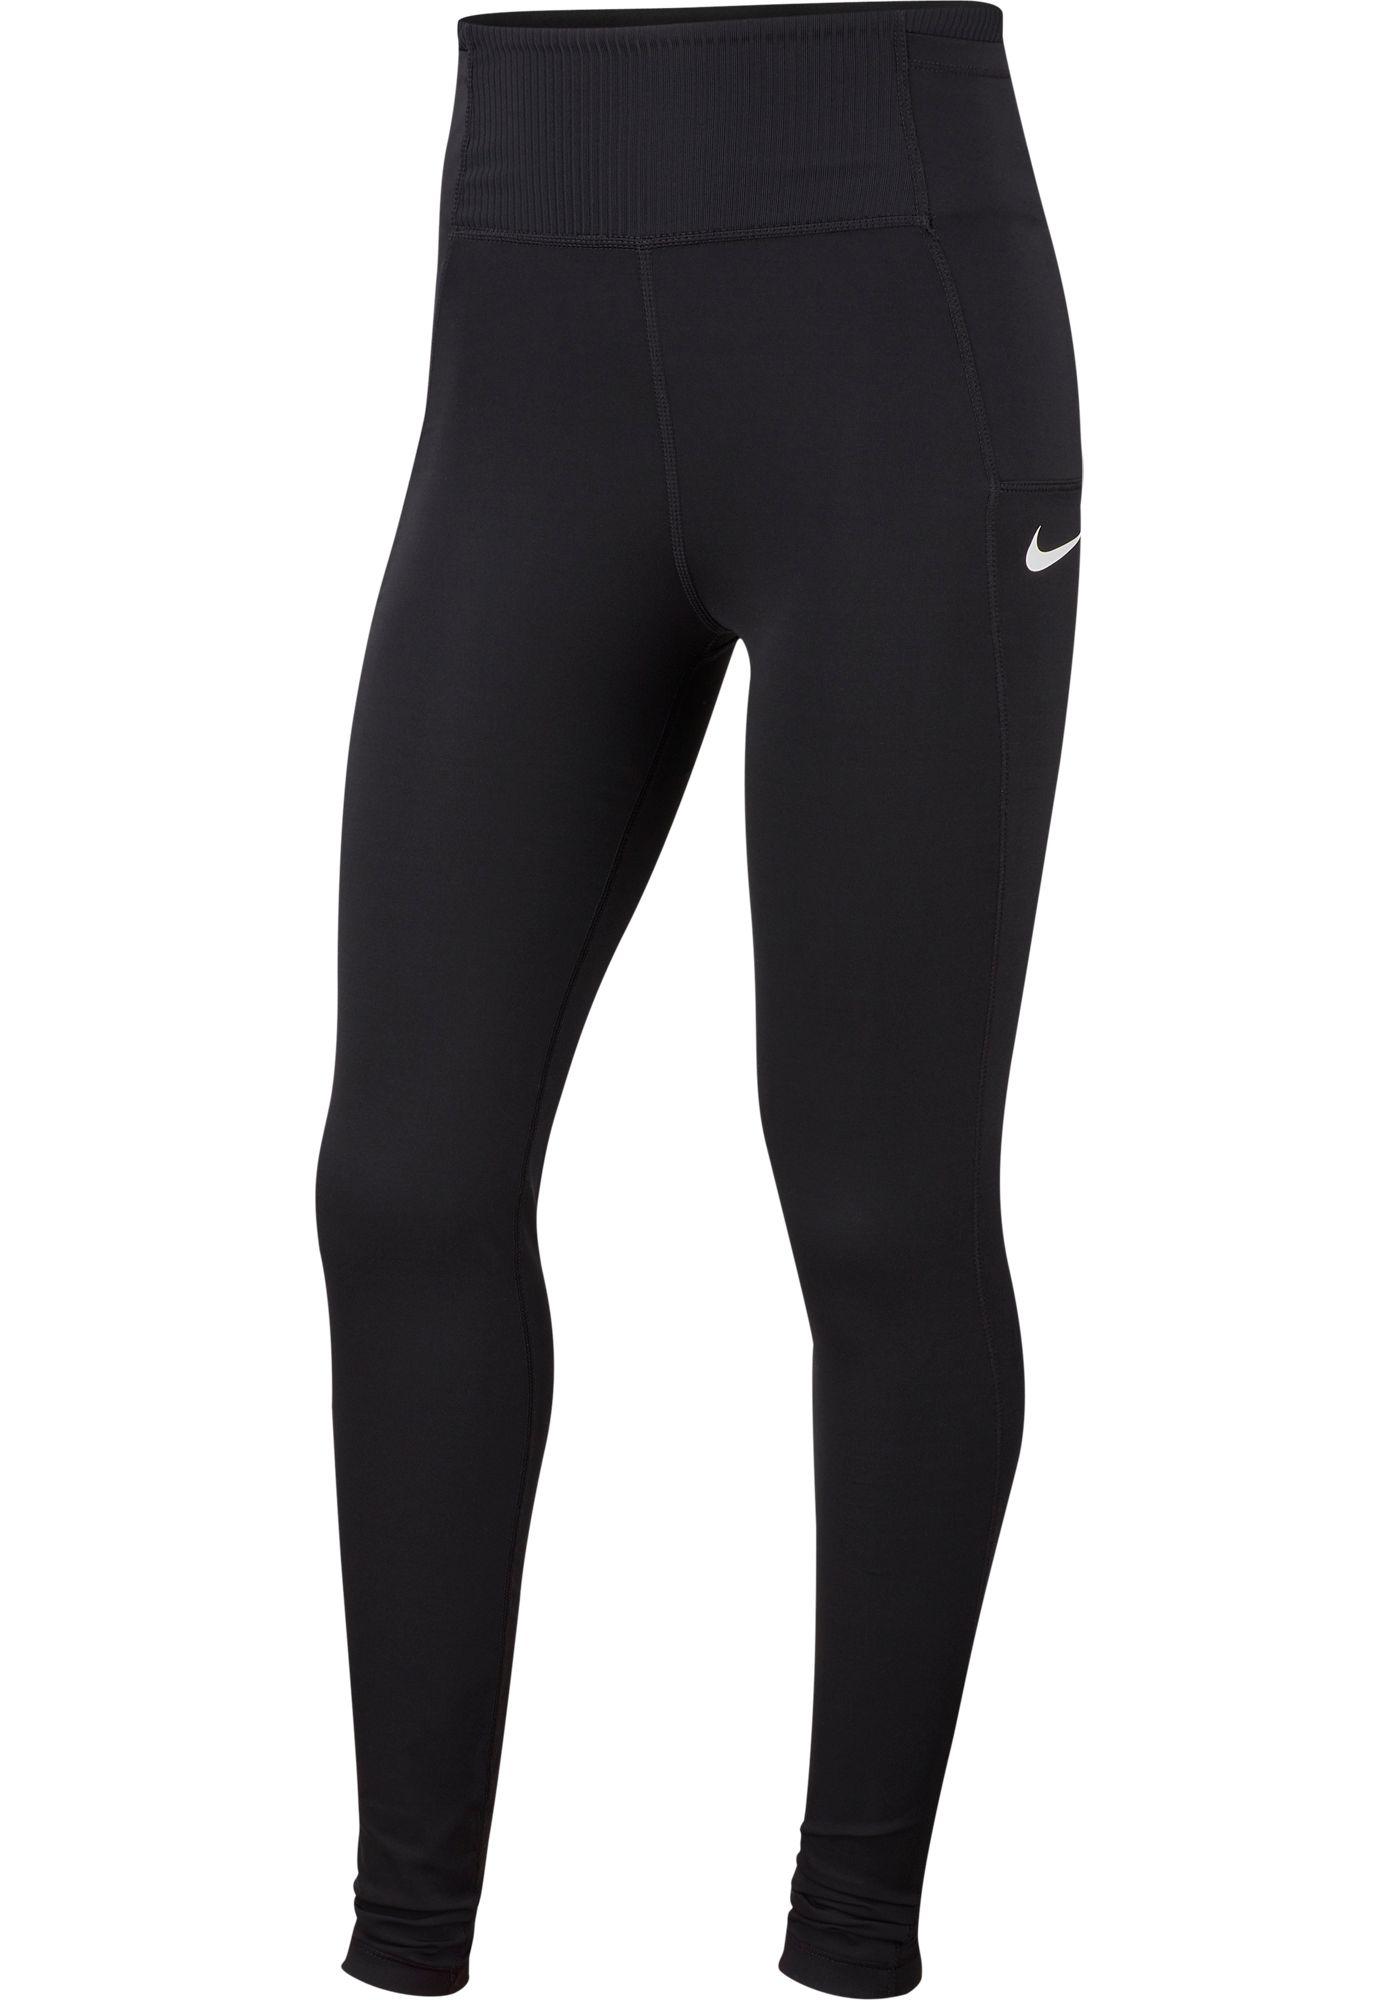 Nike Girls' High Waist Training Tights